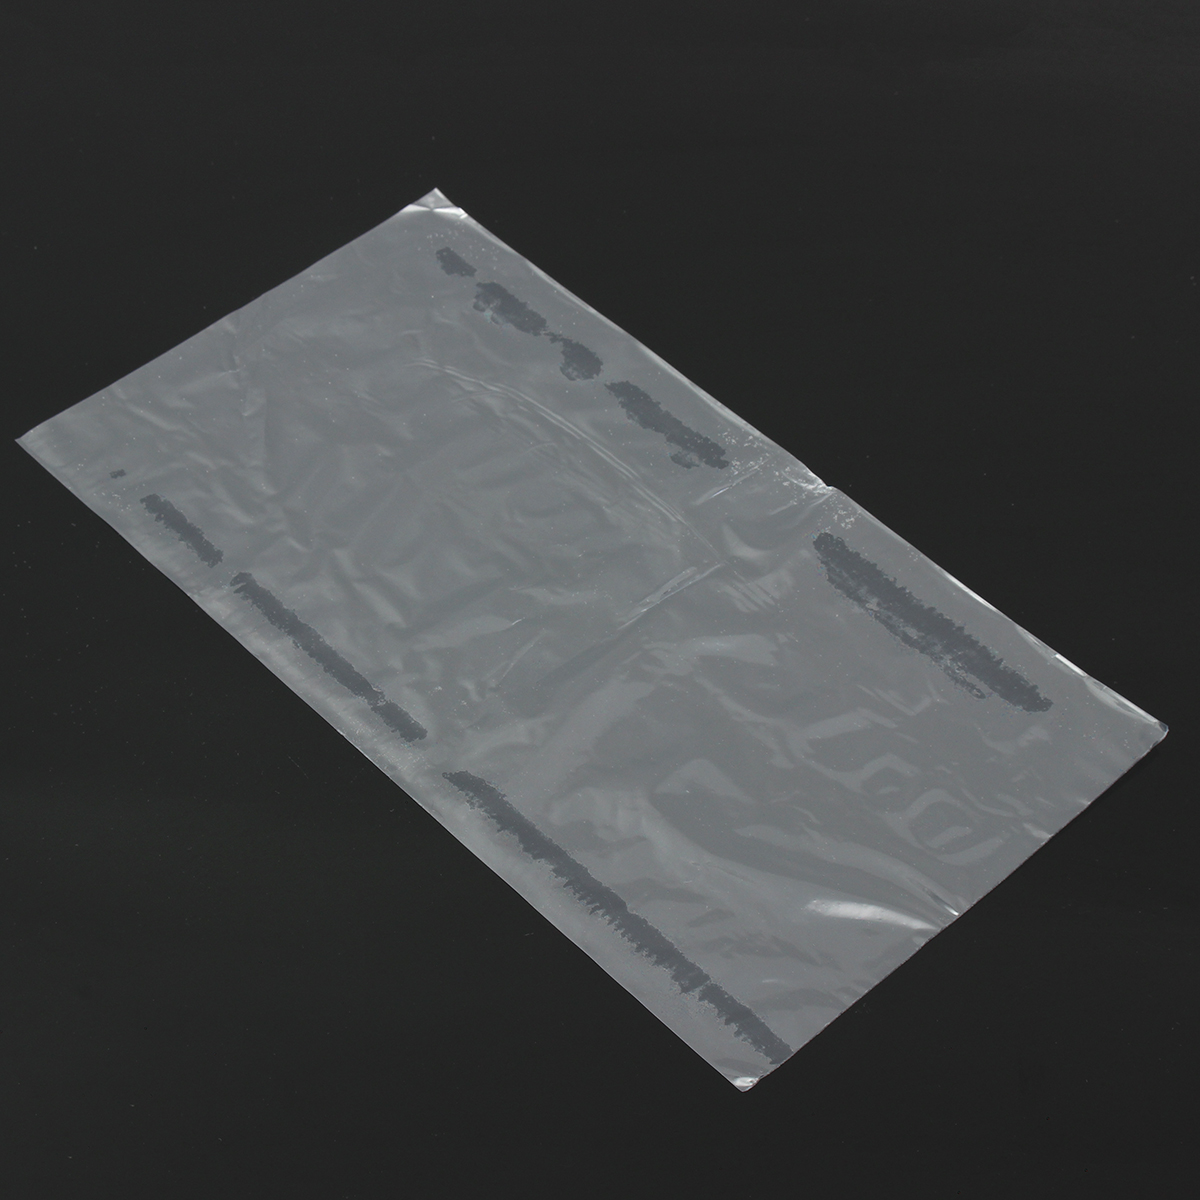 500Pcs PVC Heat Shrink Wrap Bags Film Clear Flat Poly Storage Bag Soap Candles Packaging 15×27cm